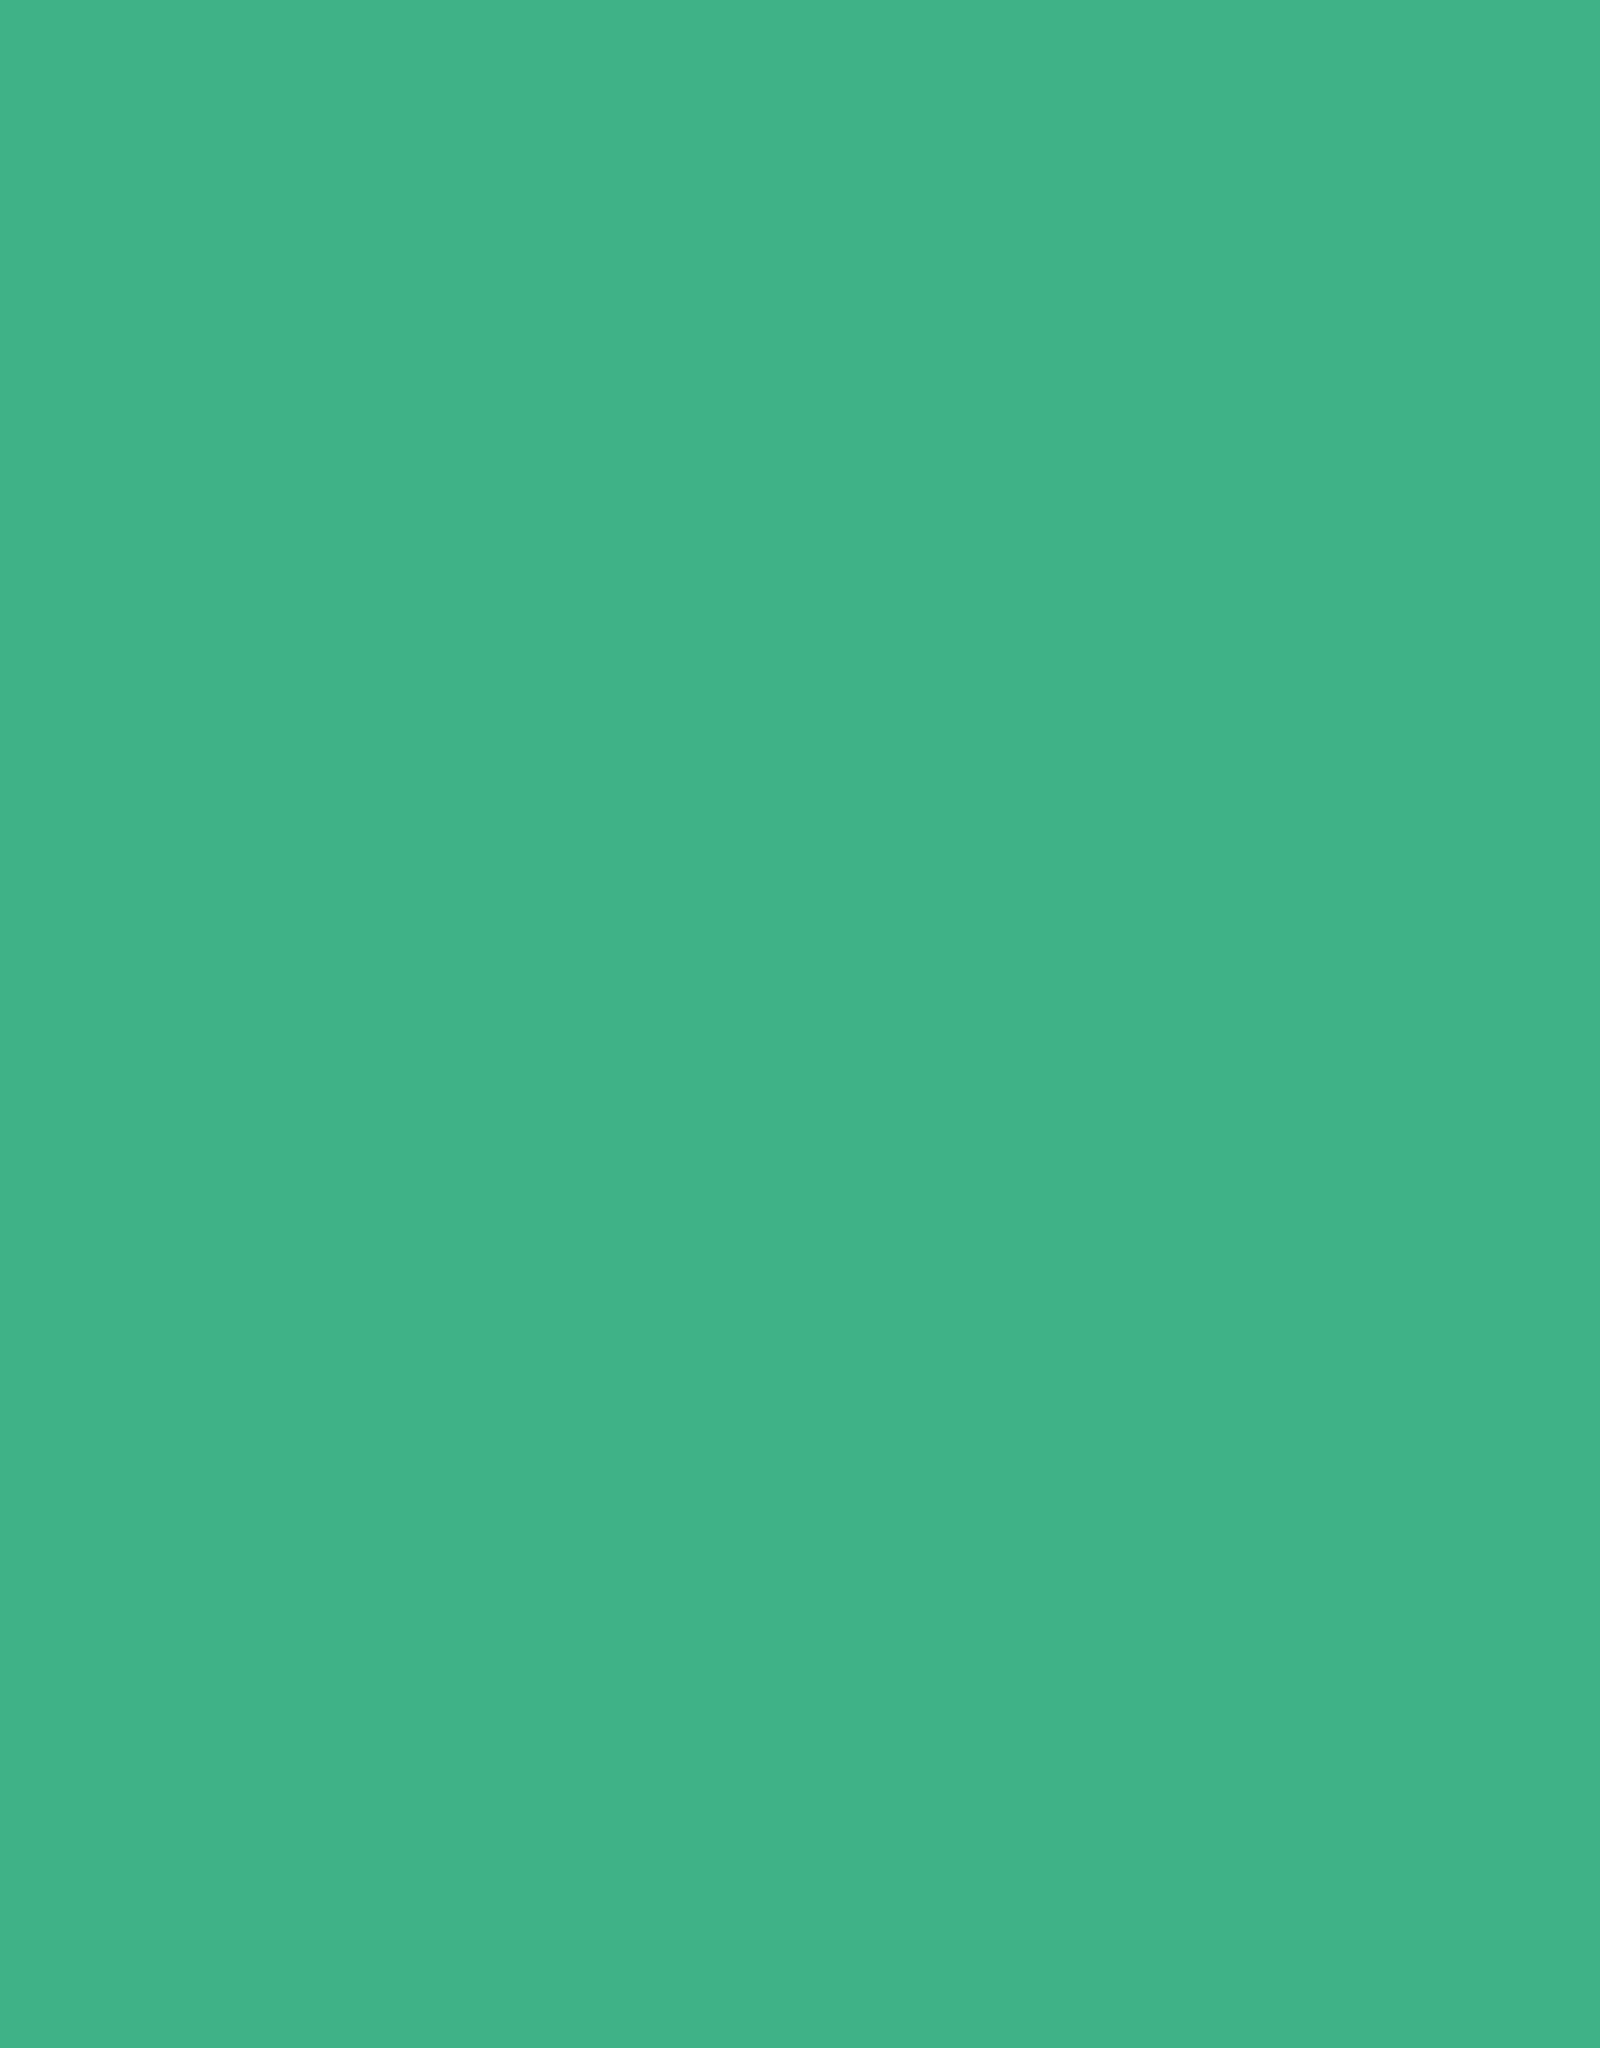 Sennelier, Extra Fine Soft Pastel, Lawn Green